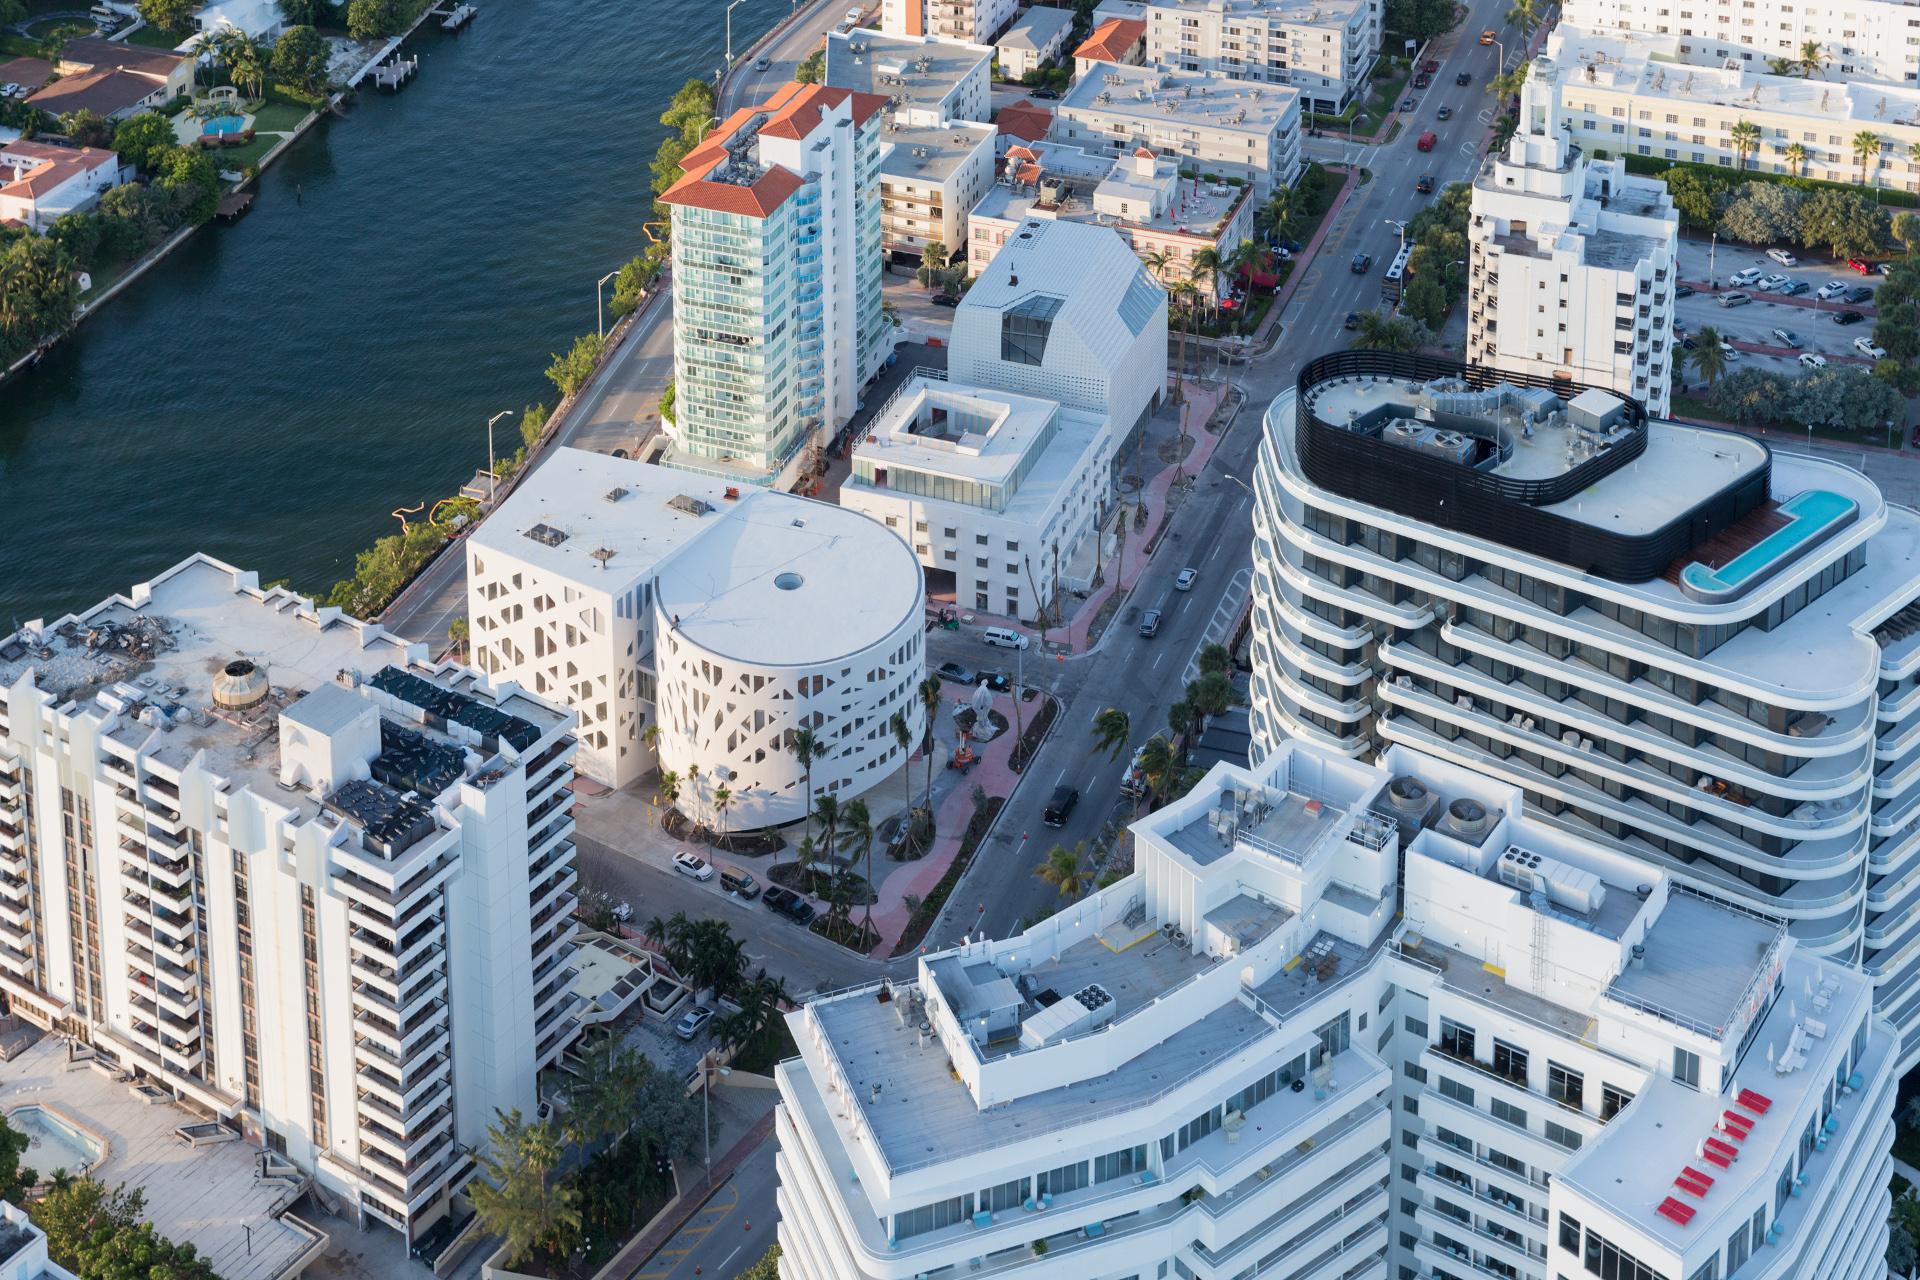 Faena Bazaar and Park in OMA's Faena District in Miami Beach